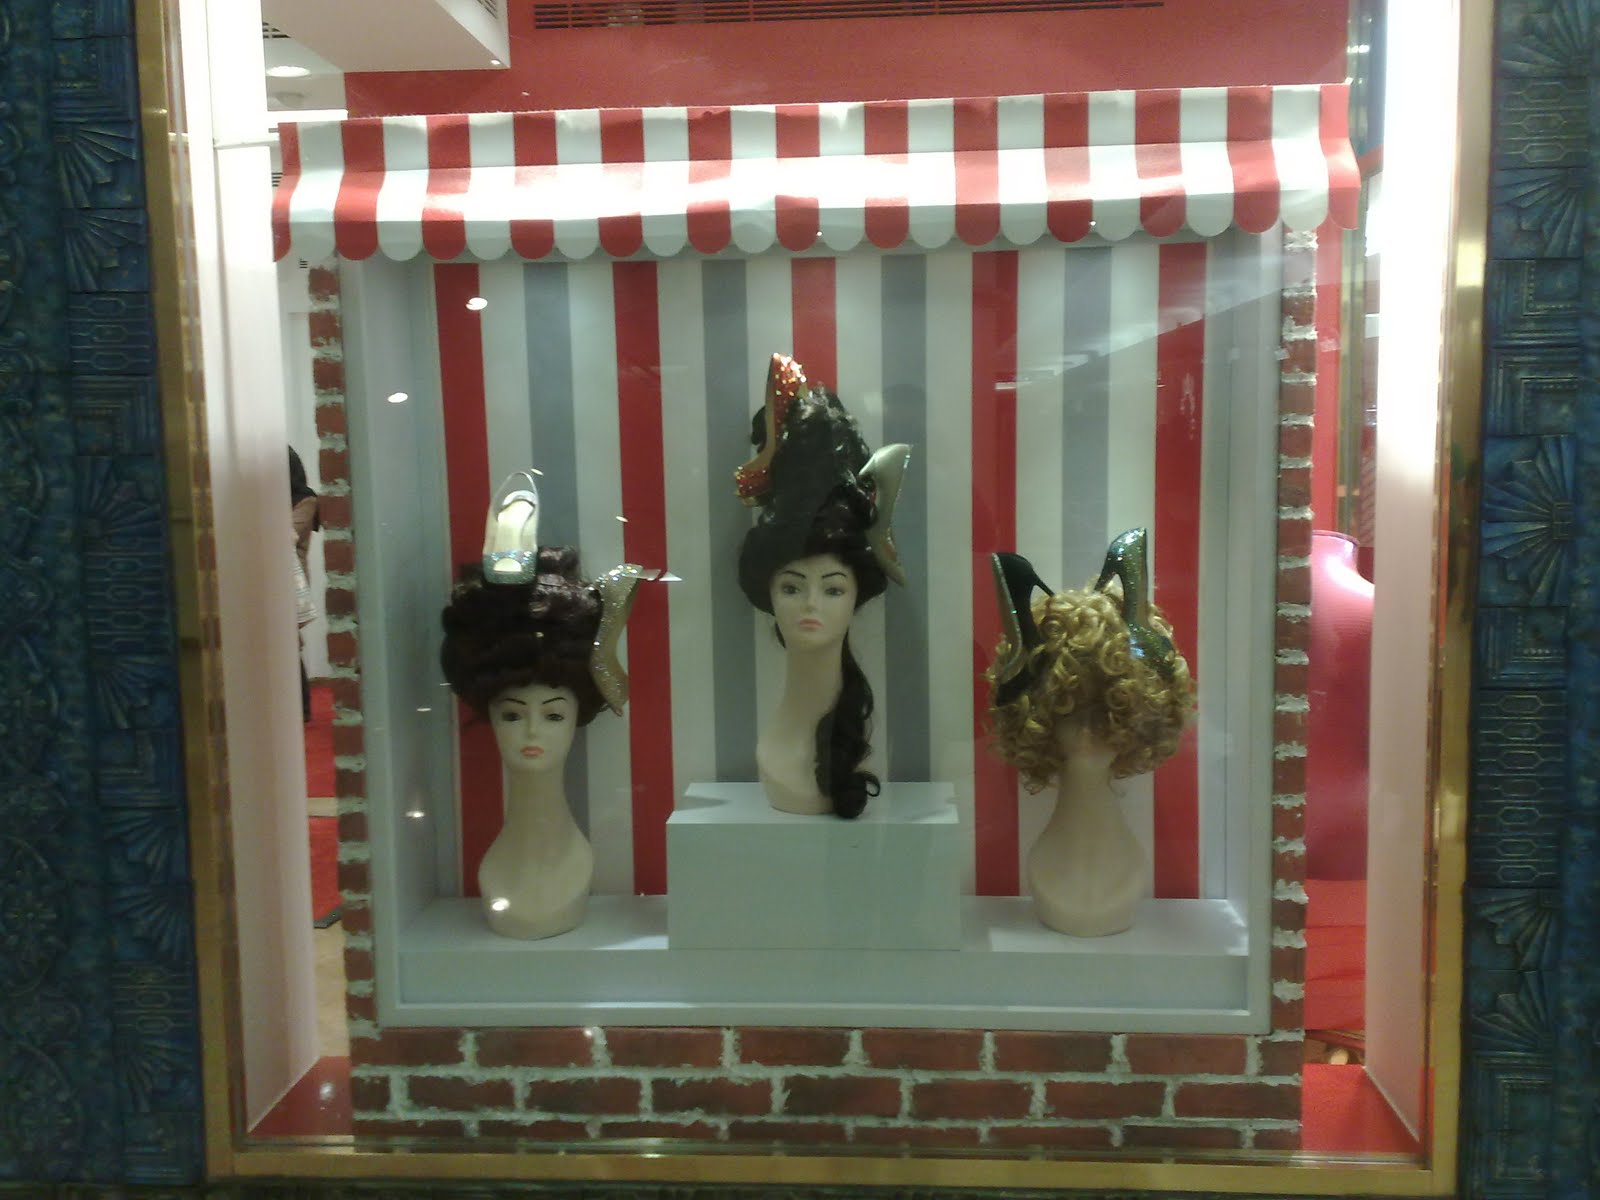 displayhunter: Christian Louboutin: Hair Salon